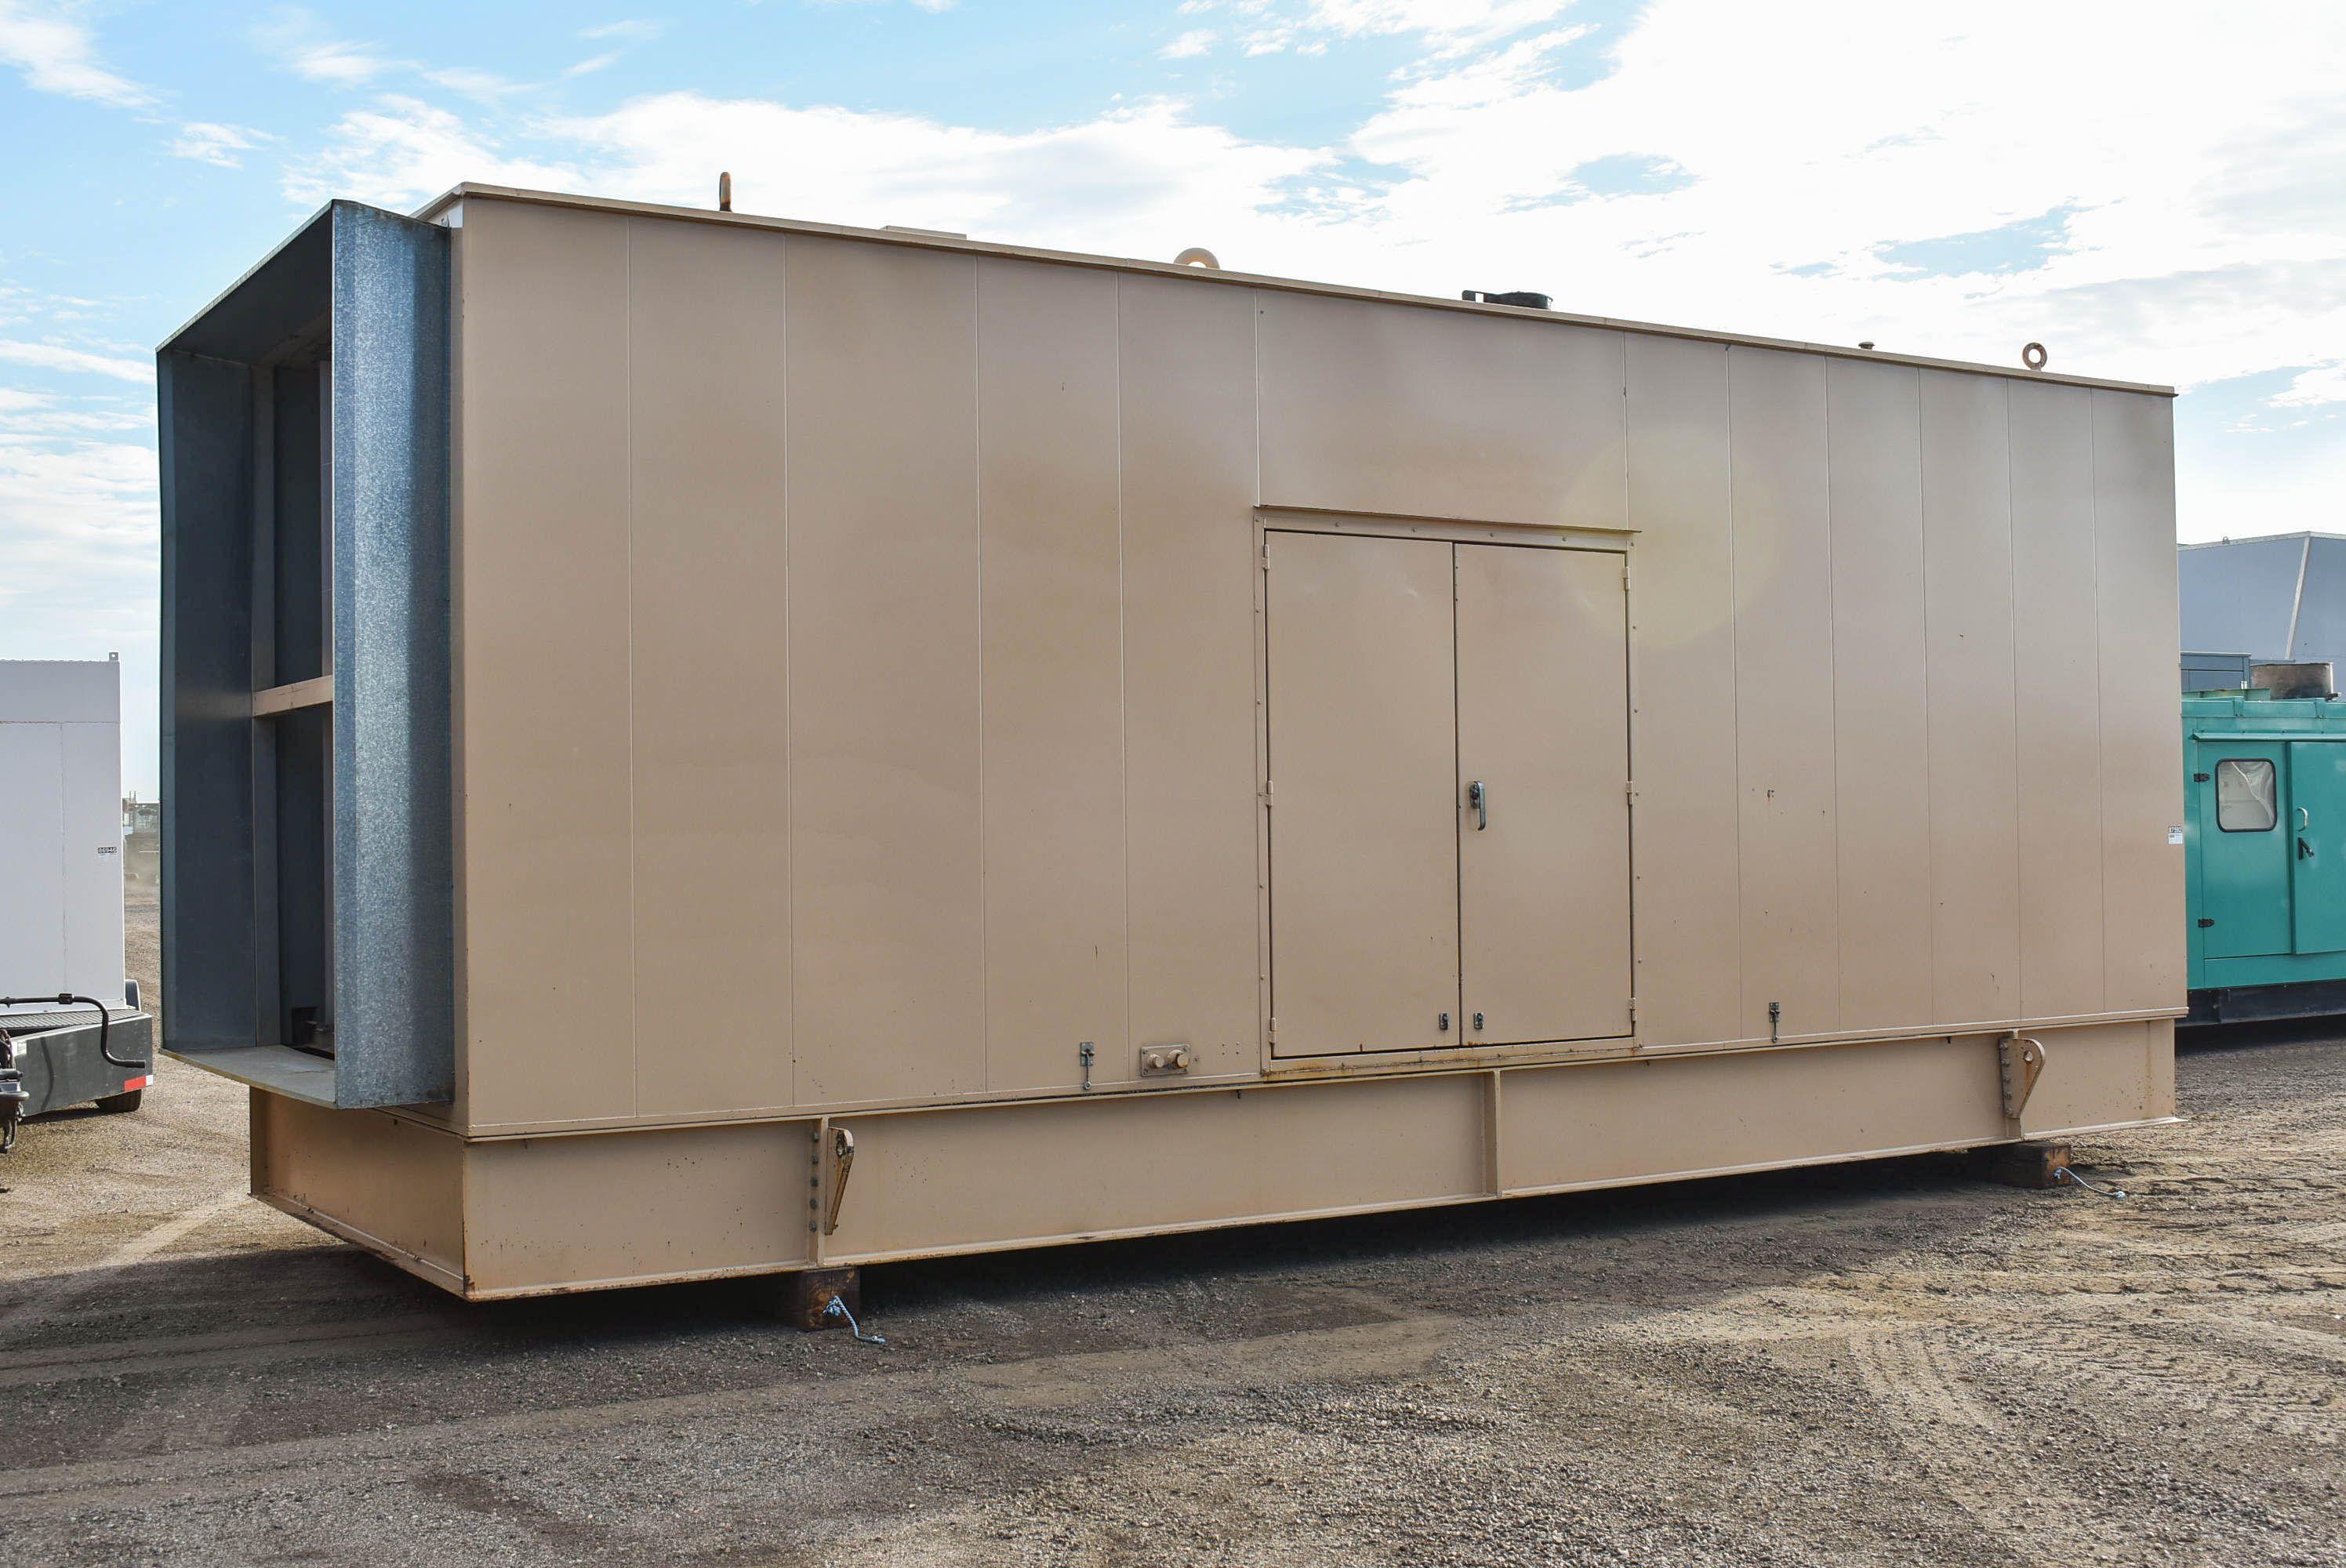 Just Arrived and For Sale! Caterpillar 1000 kW Diesel Generator Set  Unit-87592 Model #SR-4B 480 Volt, 150… | Natural gas generator, Diesel  generators, Gas generator